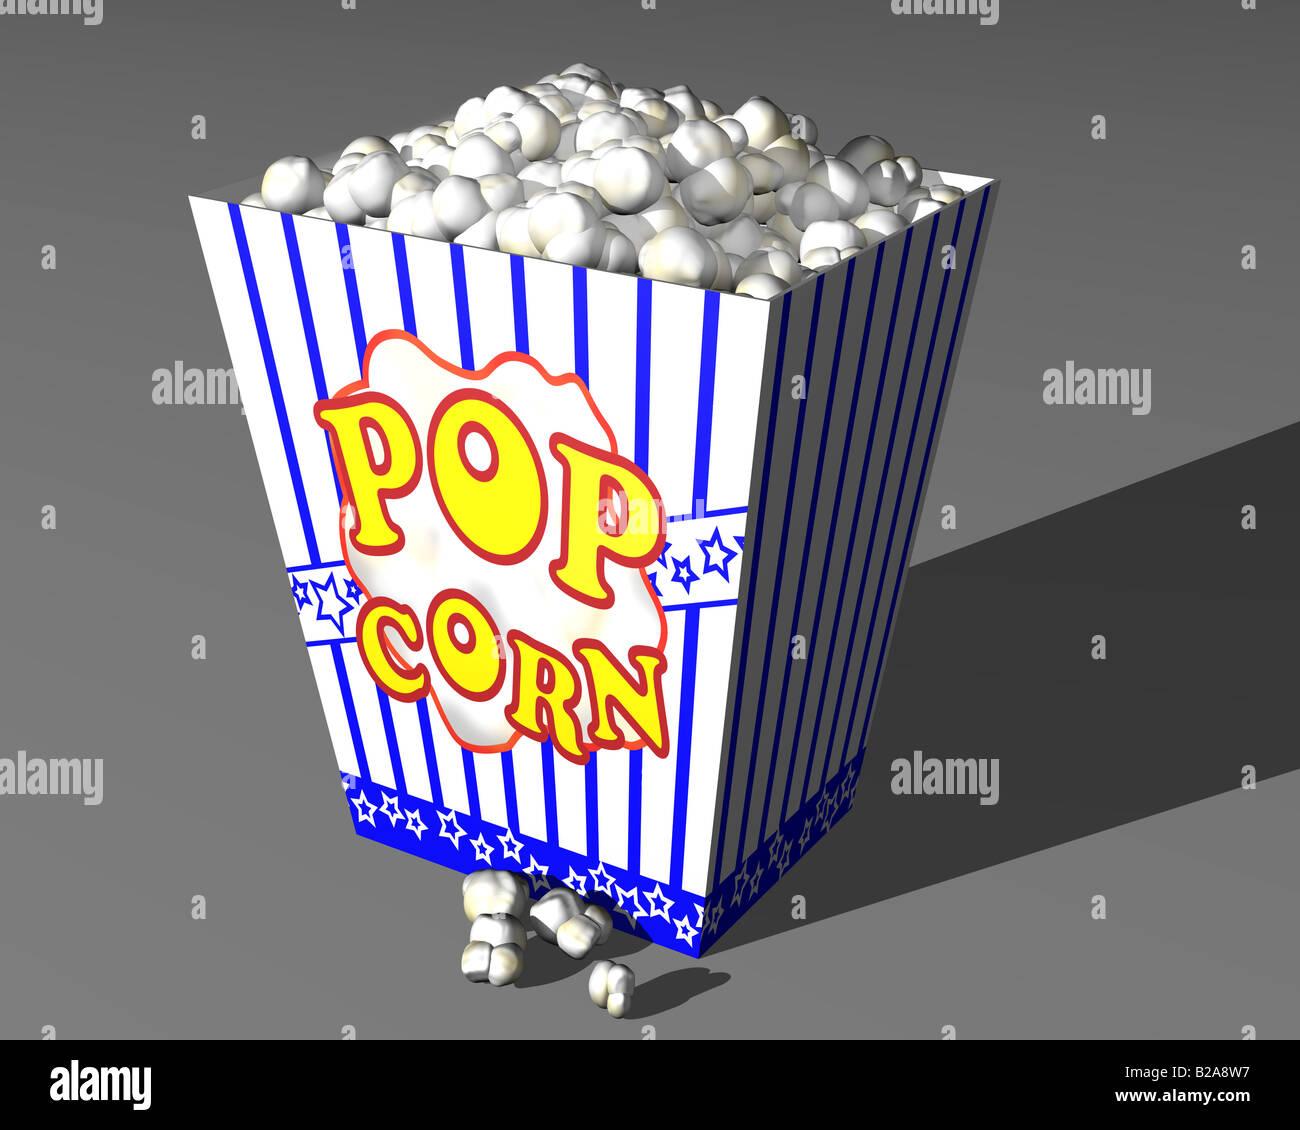 Illustration of a large box of cinema popcorn - Stock Image